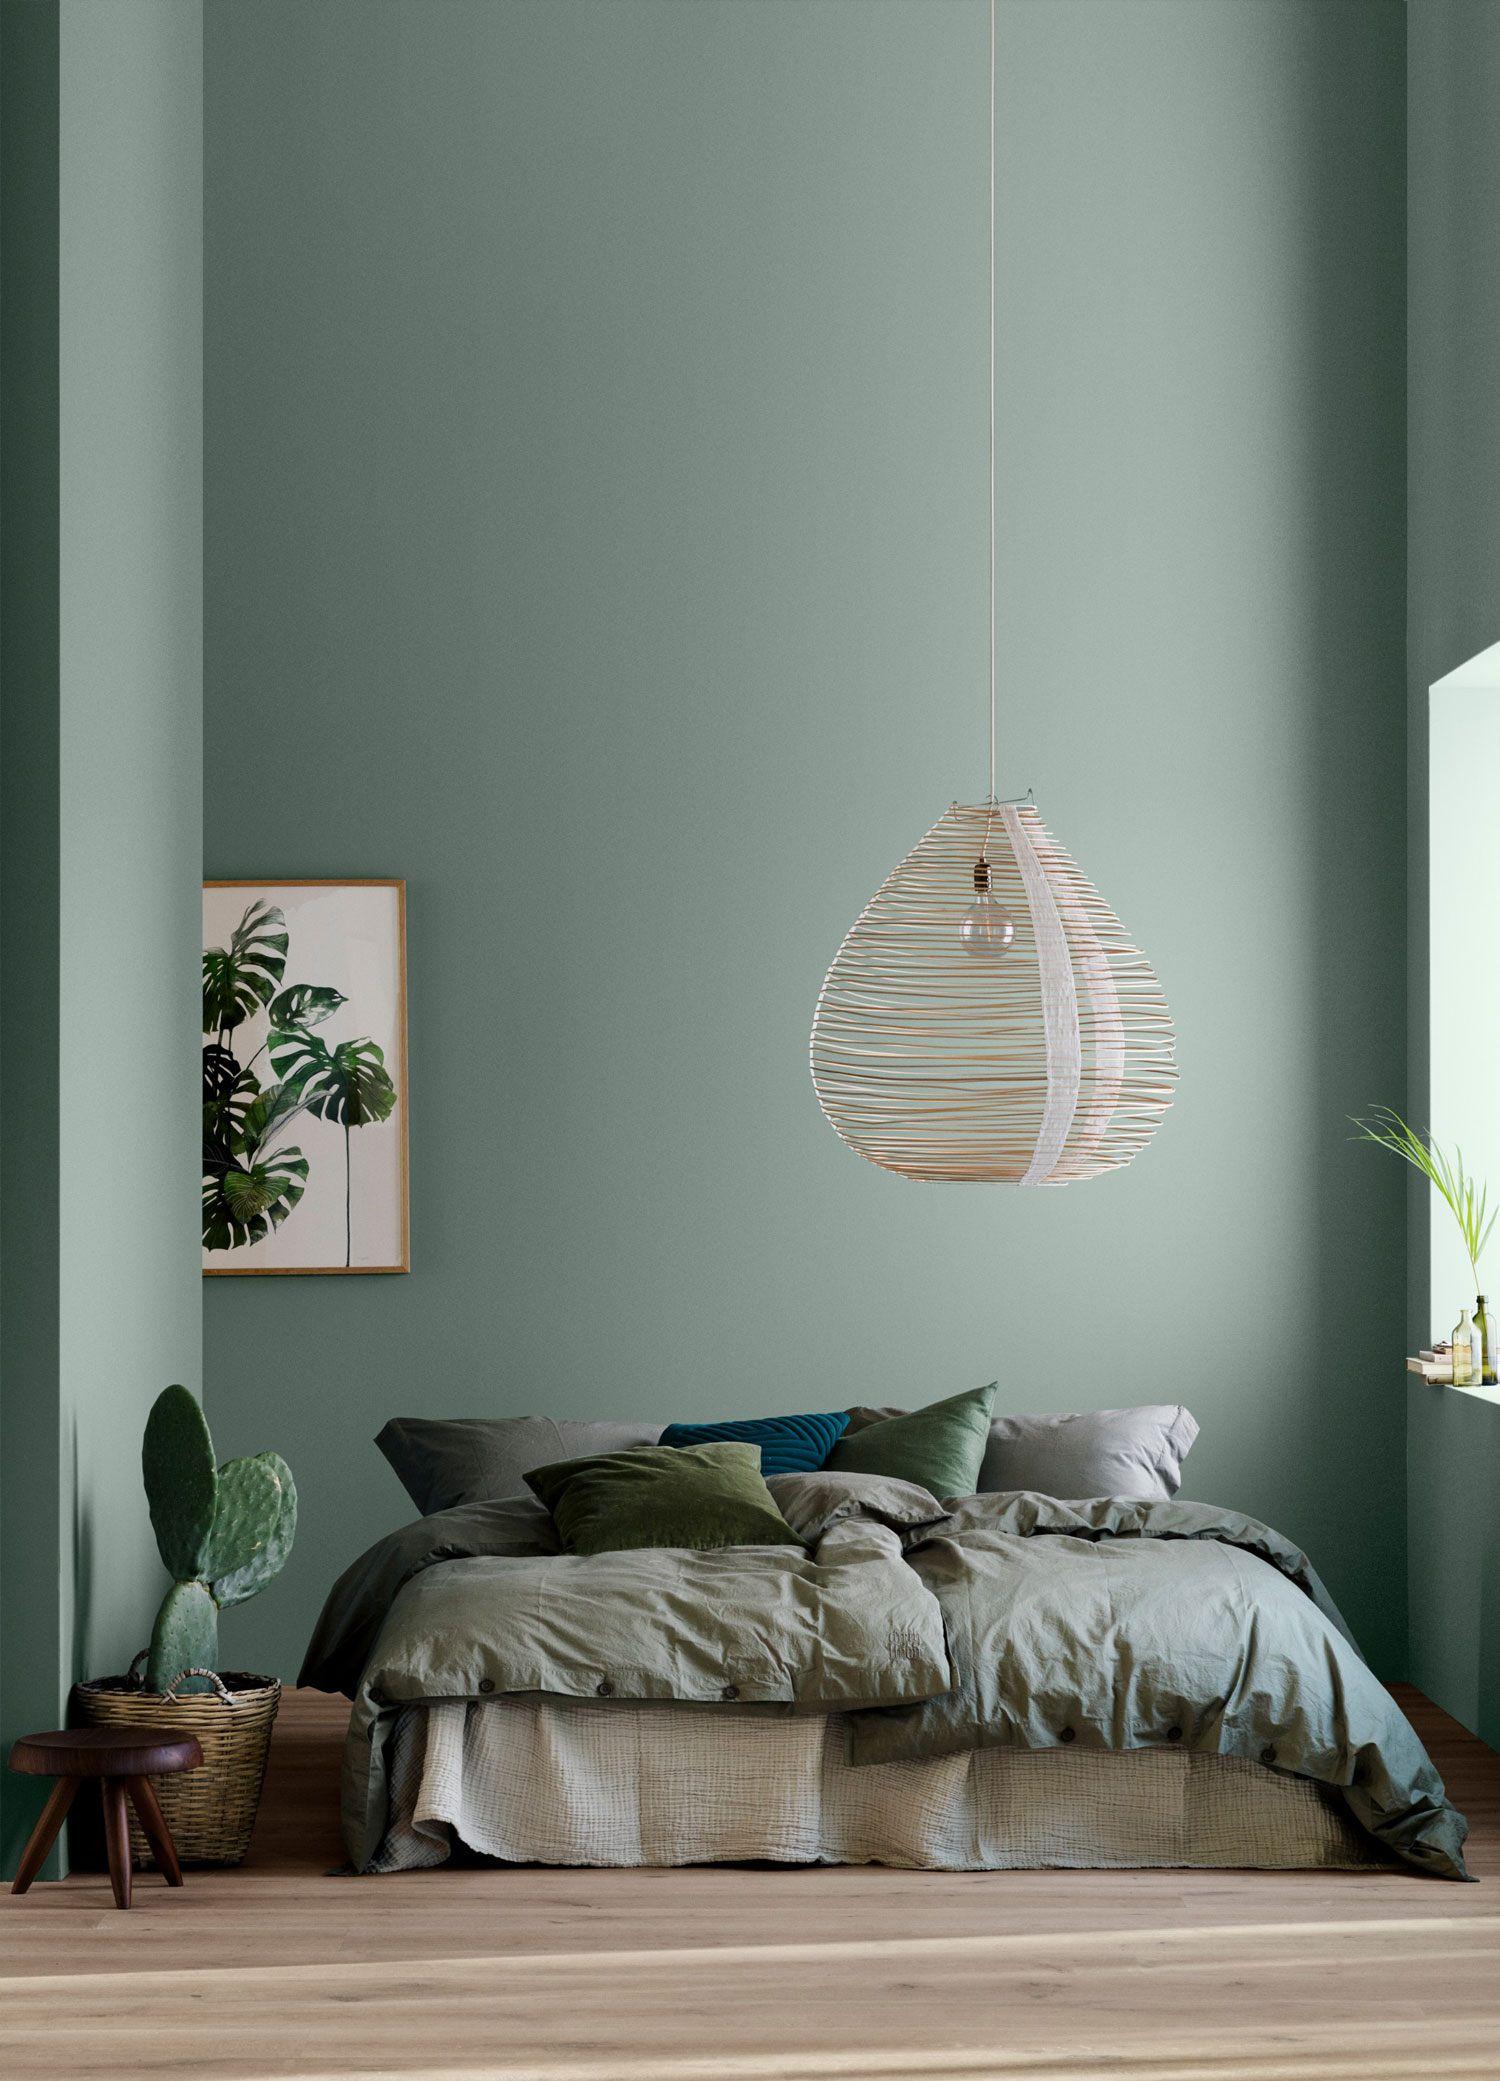 Home Paint Ideas Based On Paris Fashion Week Colors Earthy Home